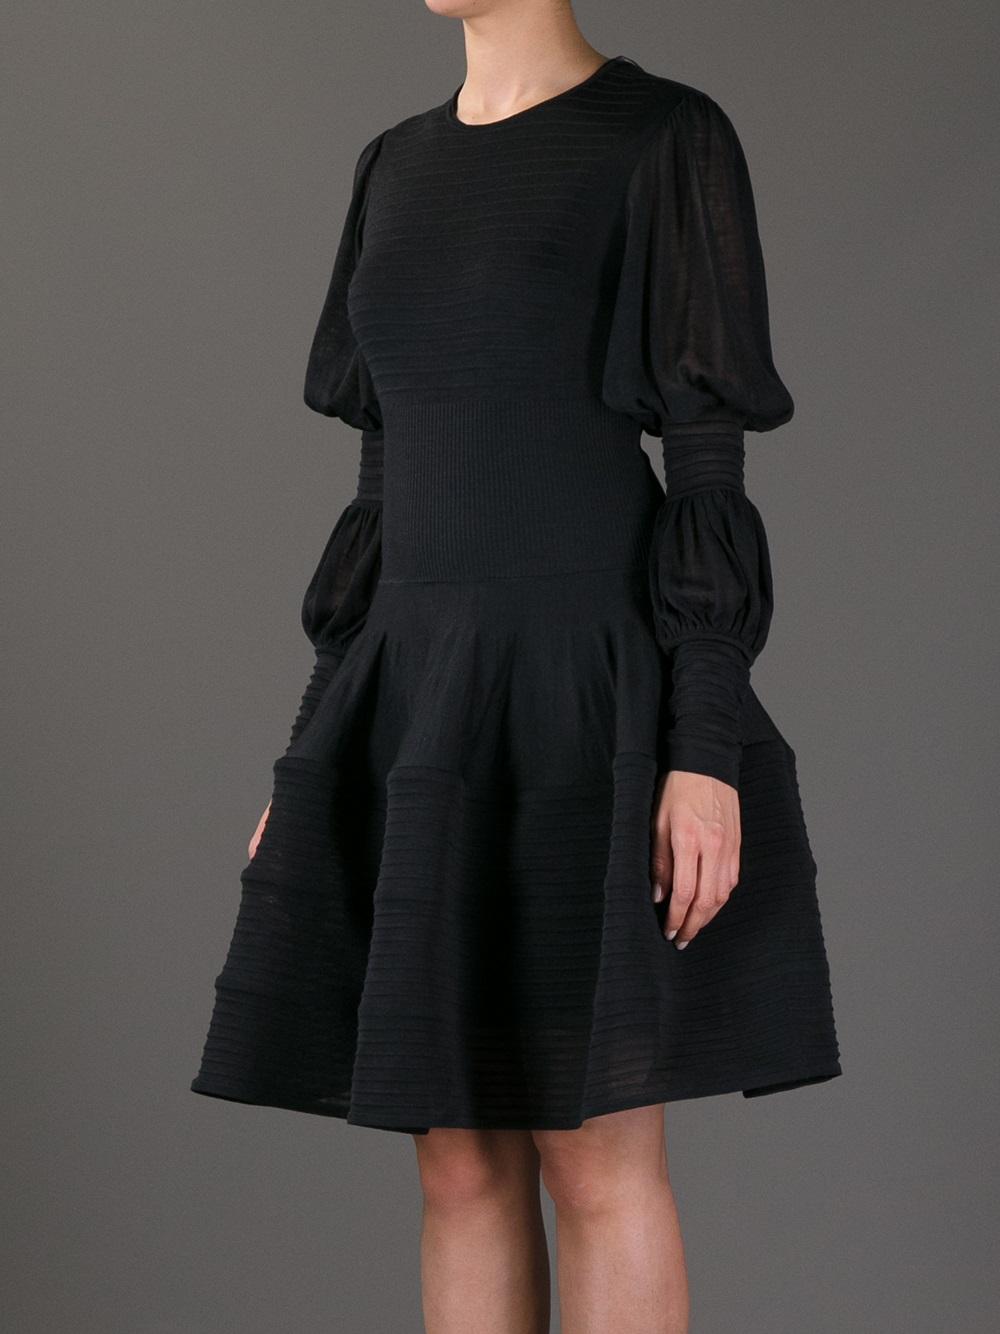 Lyst Alexander Mcqueen Semi Sheer Ribbed Dress In Black